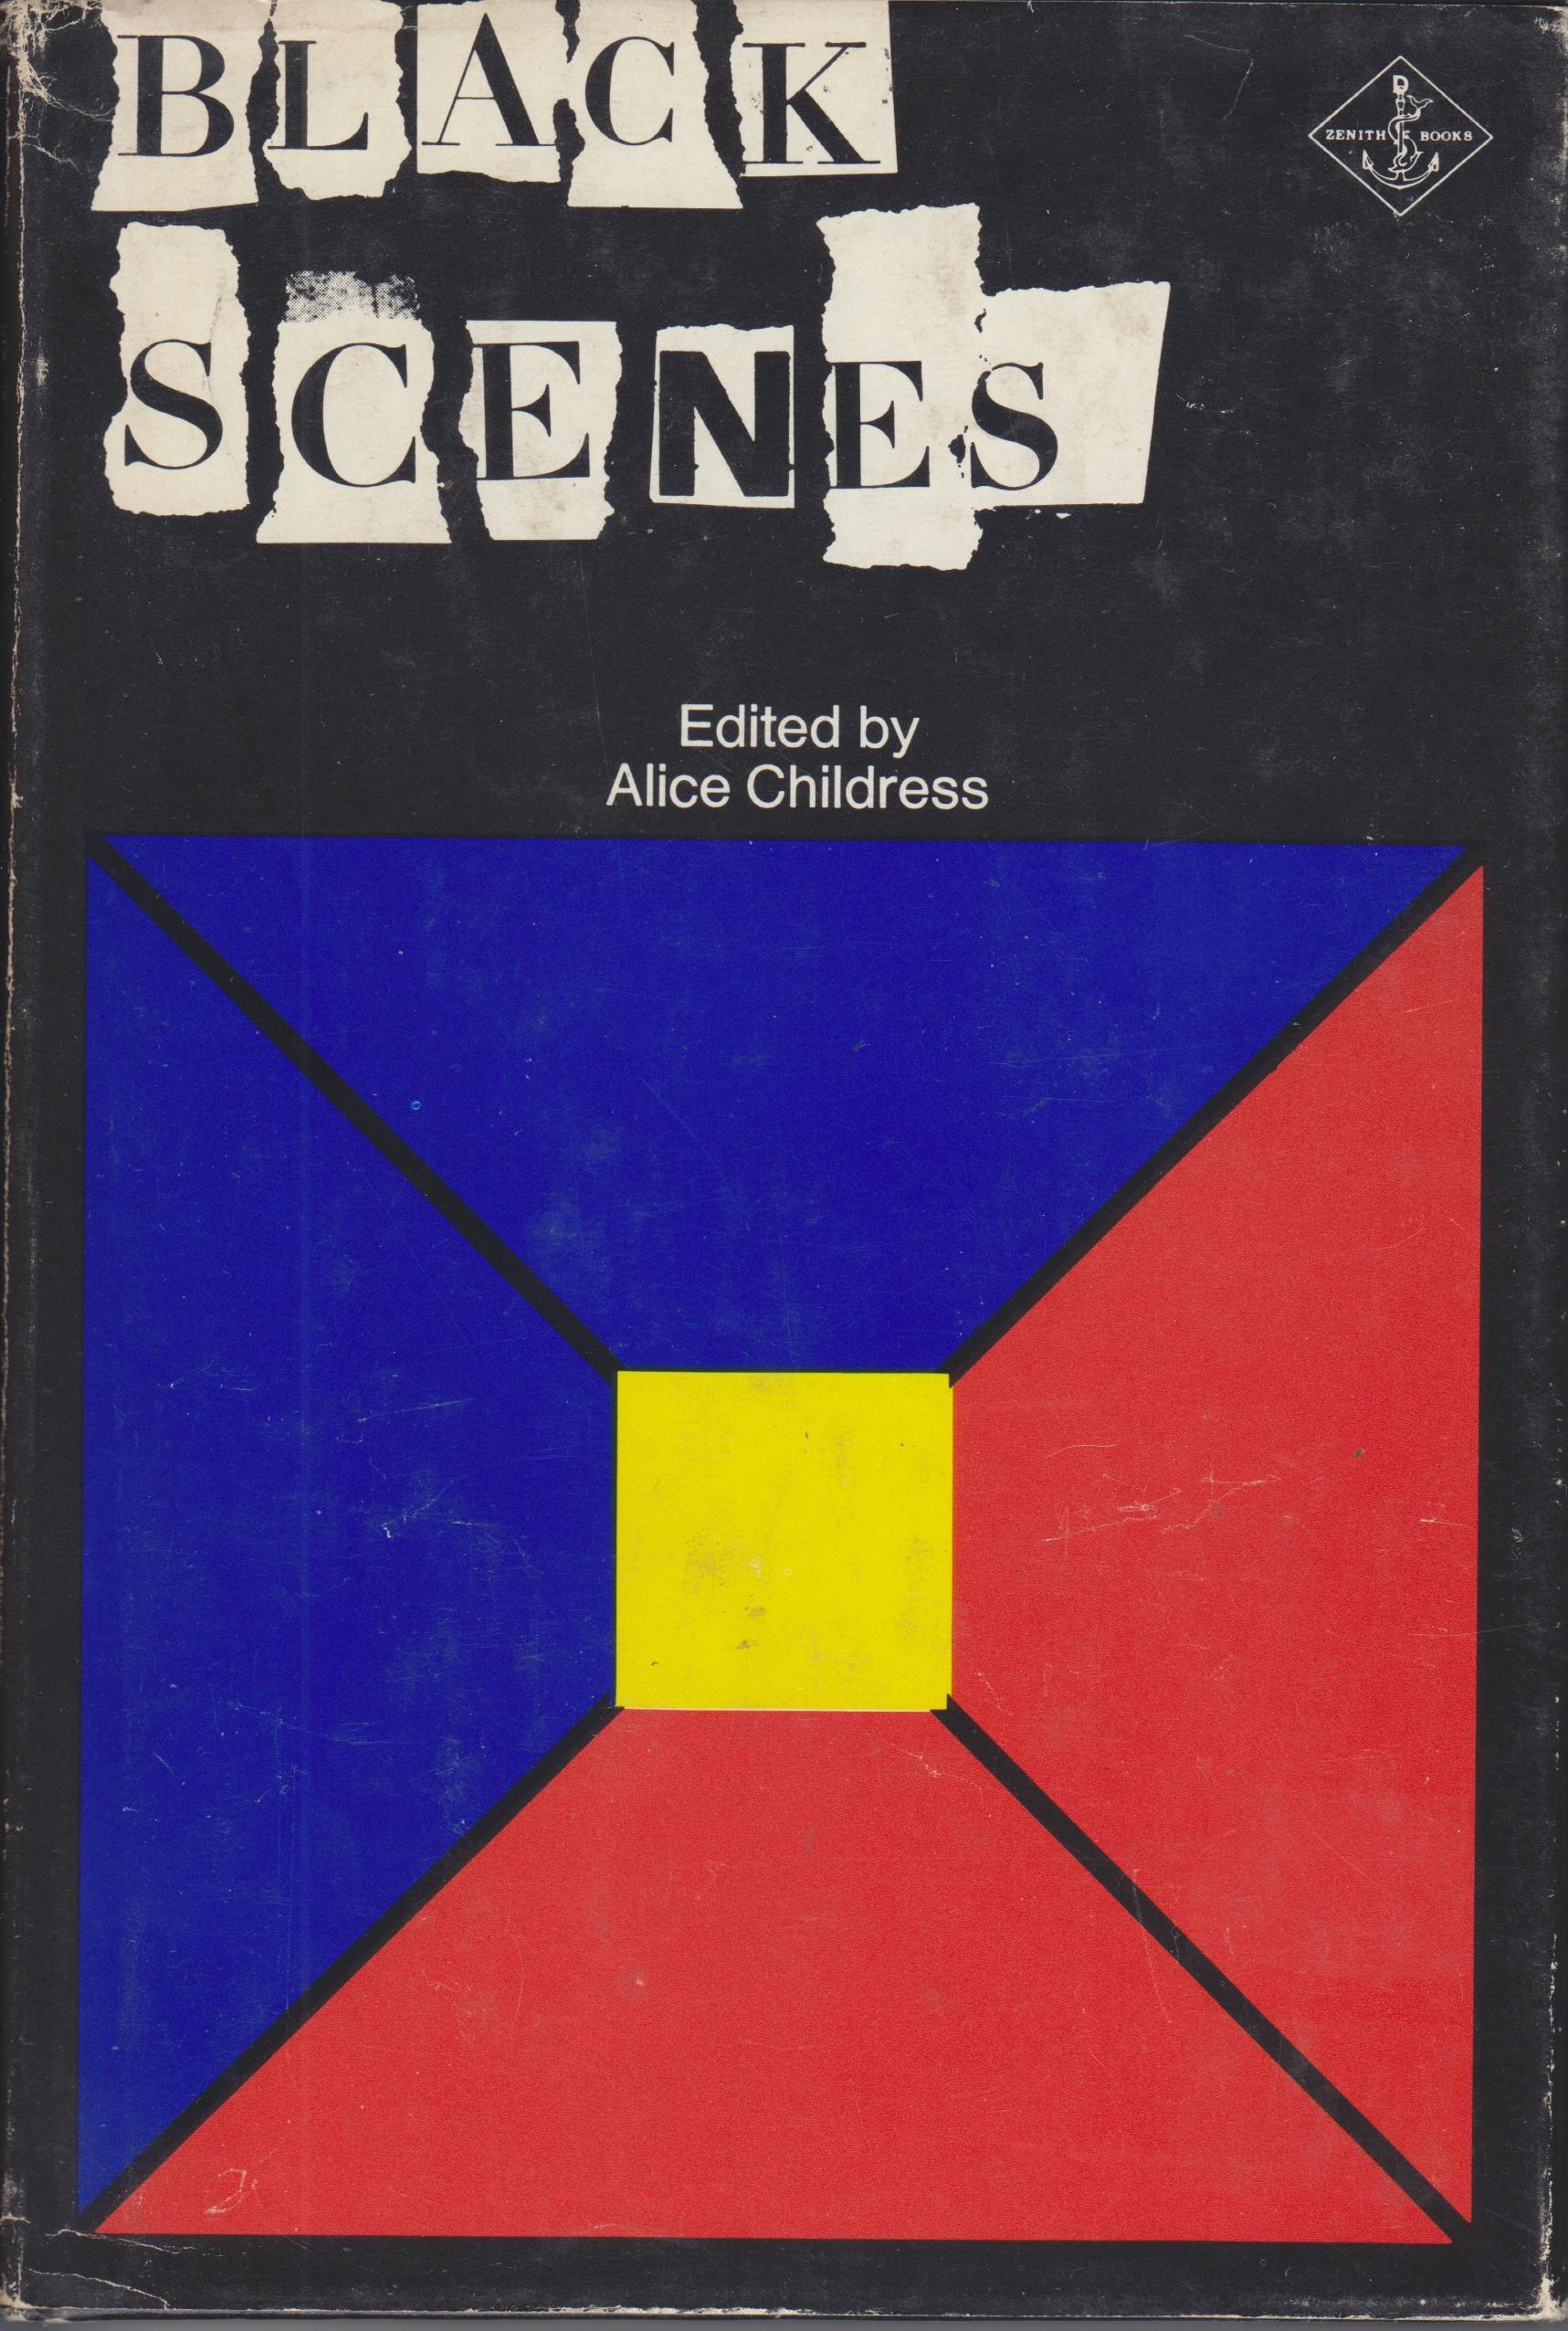 Book cover image of Black scenes